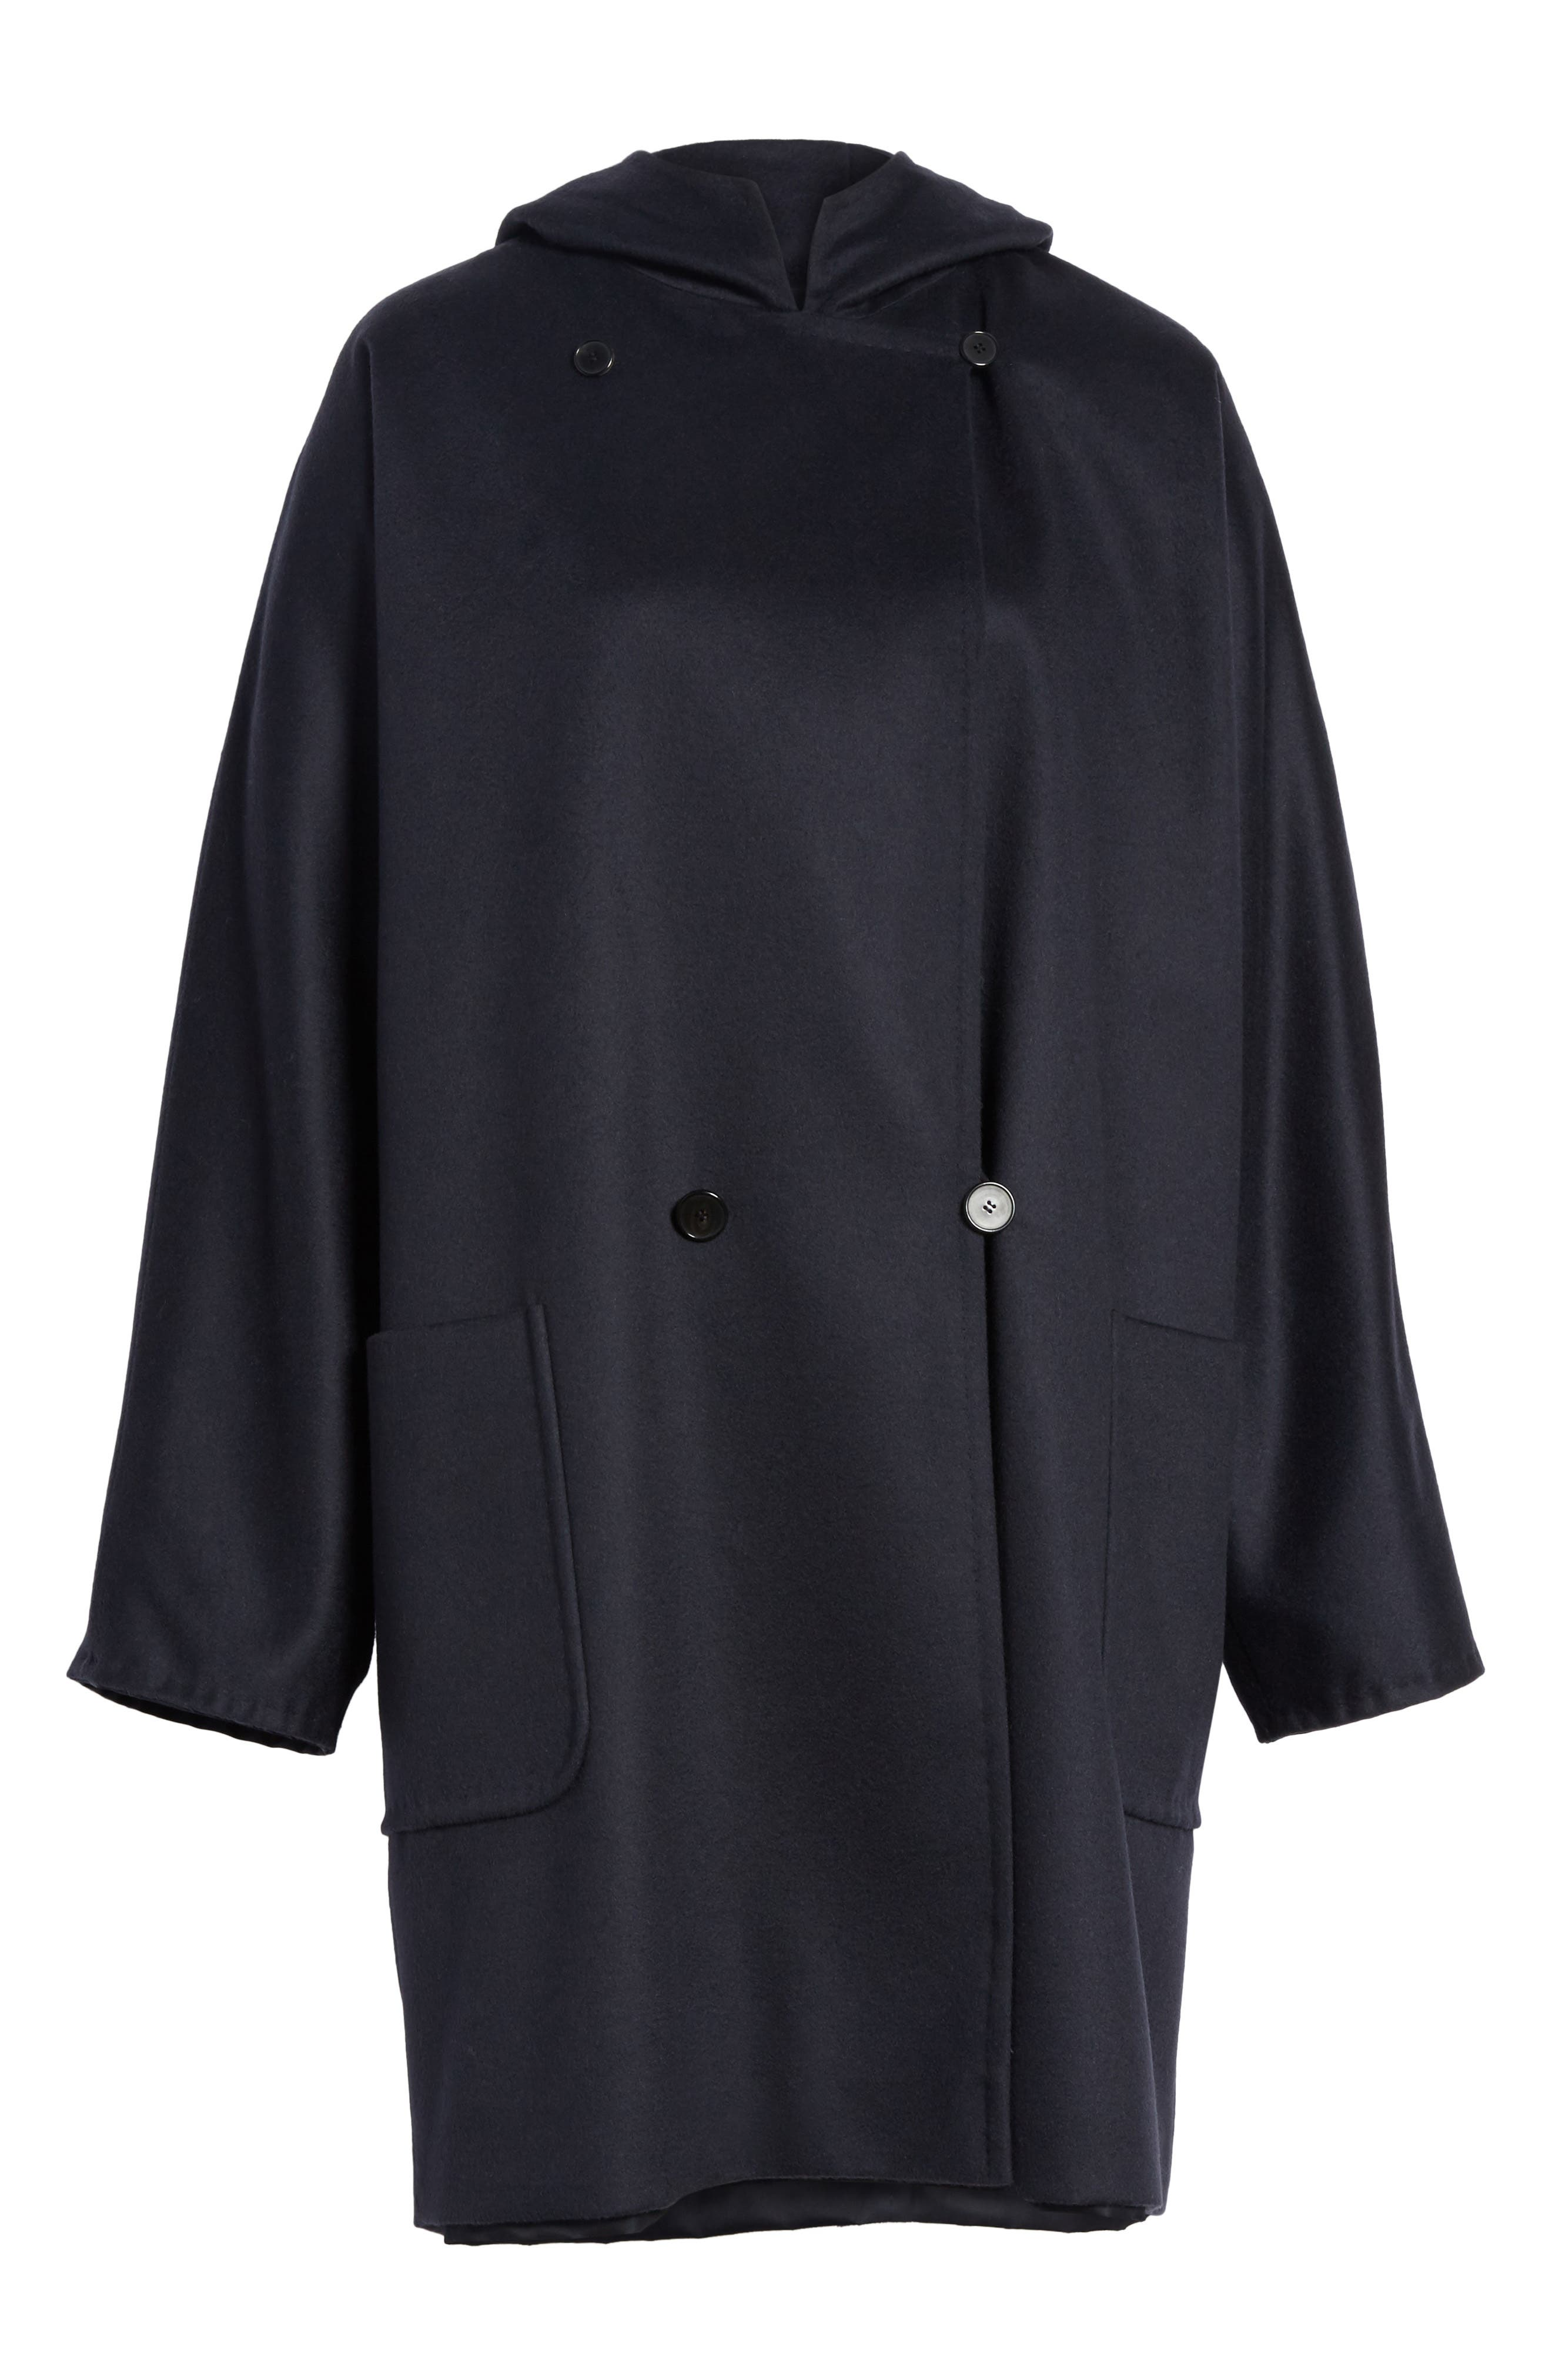 Jacopo Reversible Hooded Coat,                             Alternate thumbnail 5, color,